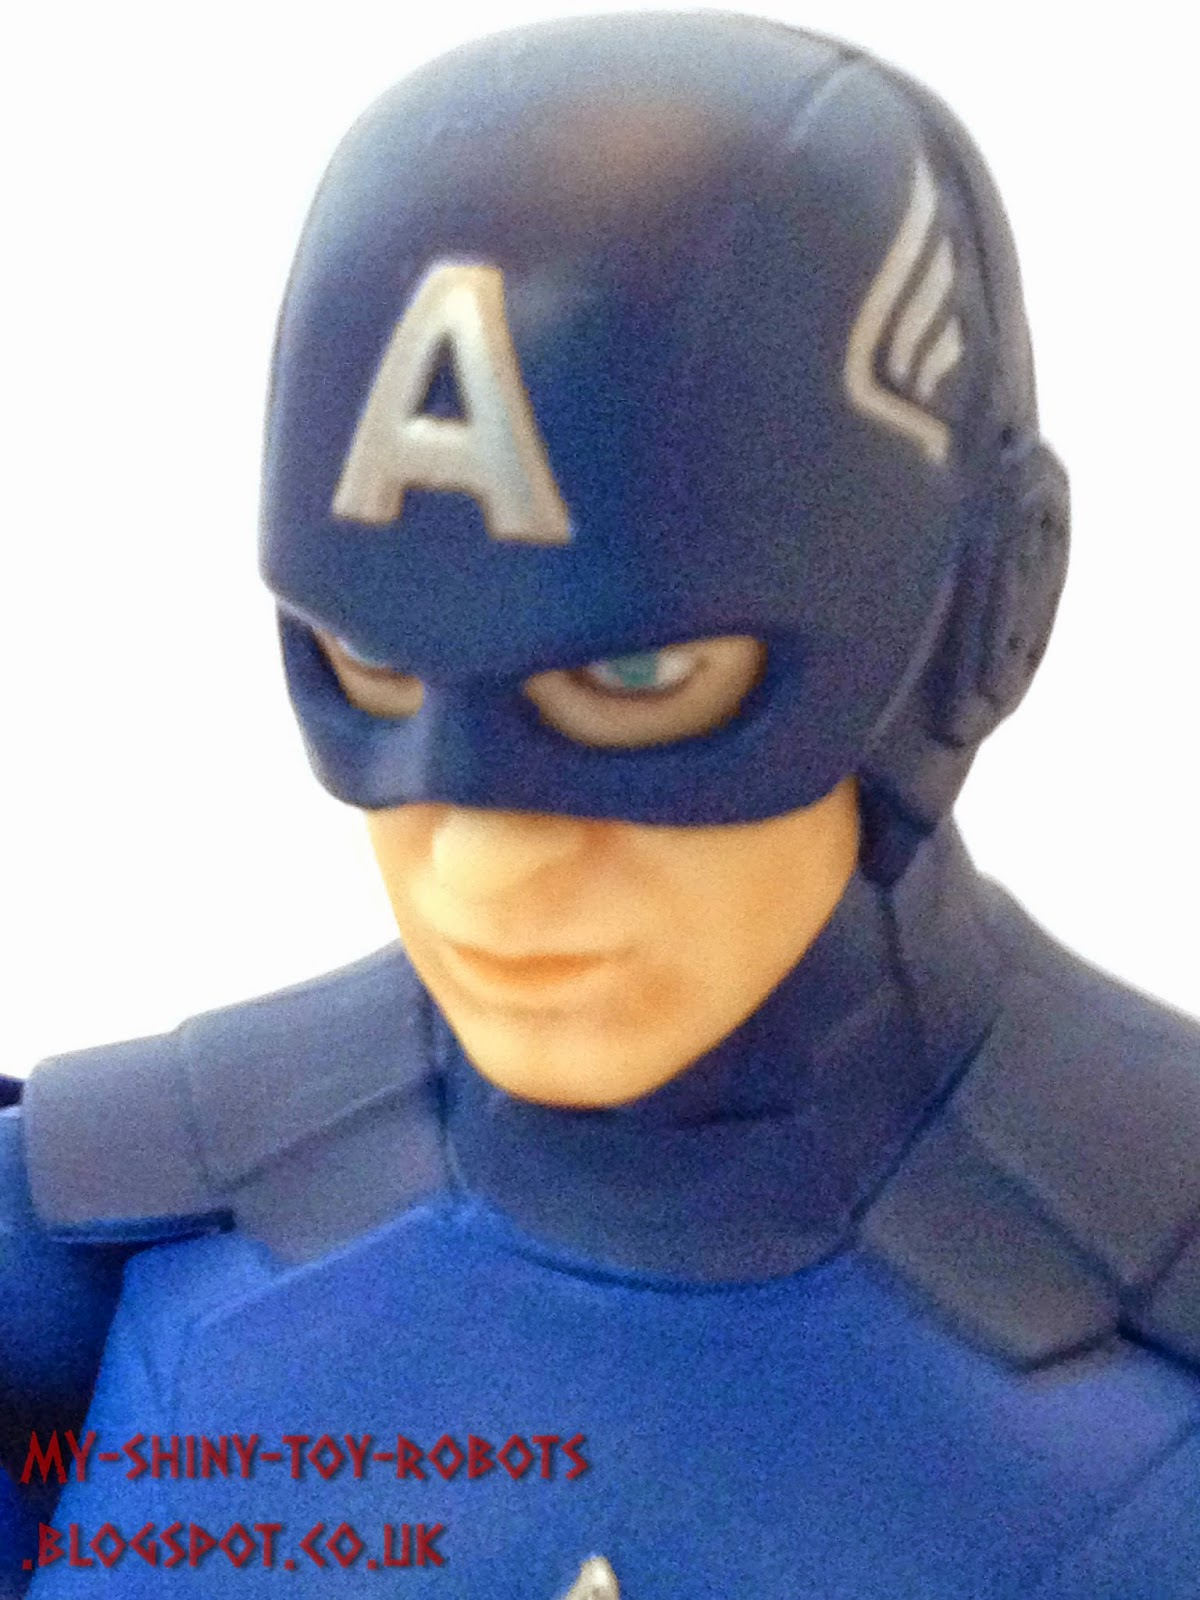 Figma Captain America